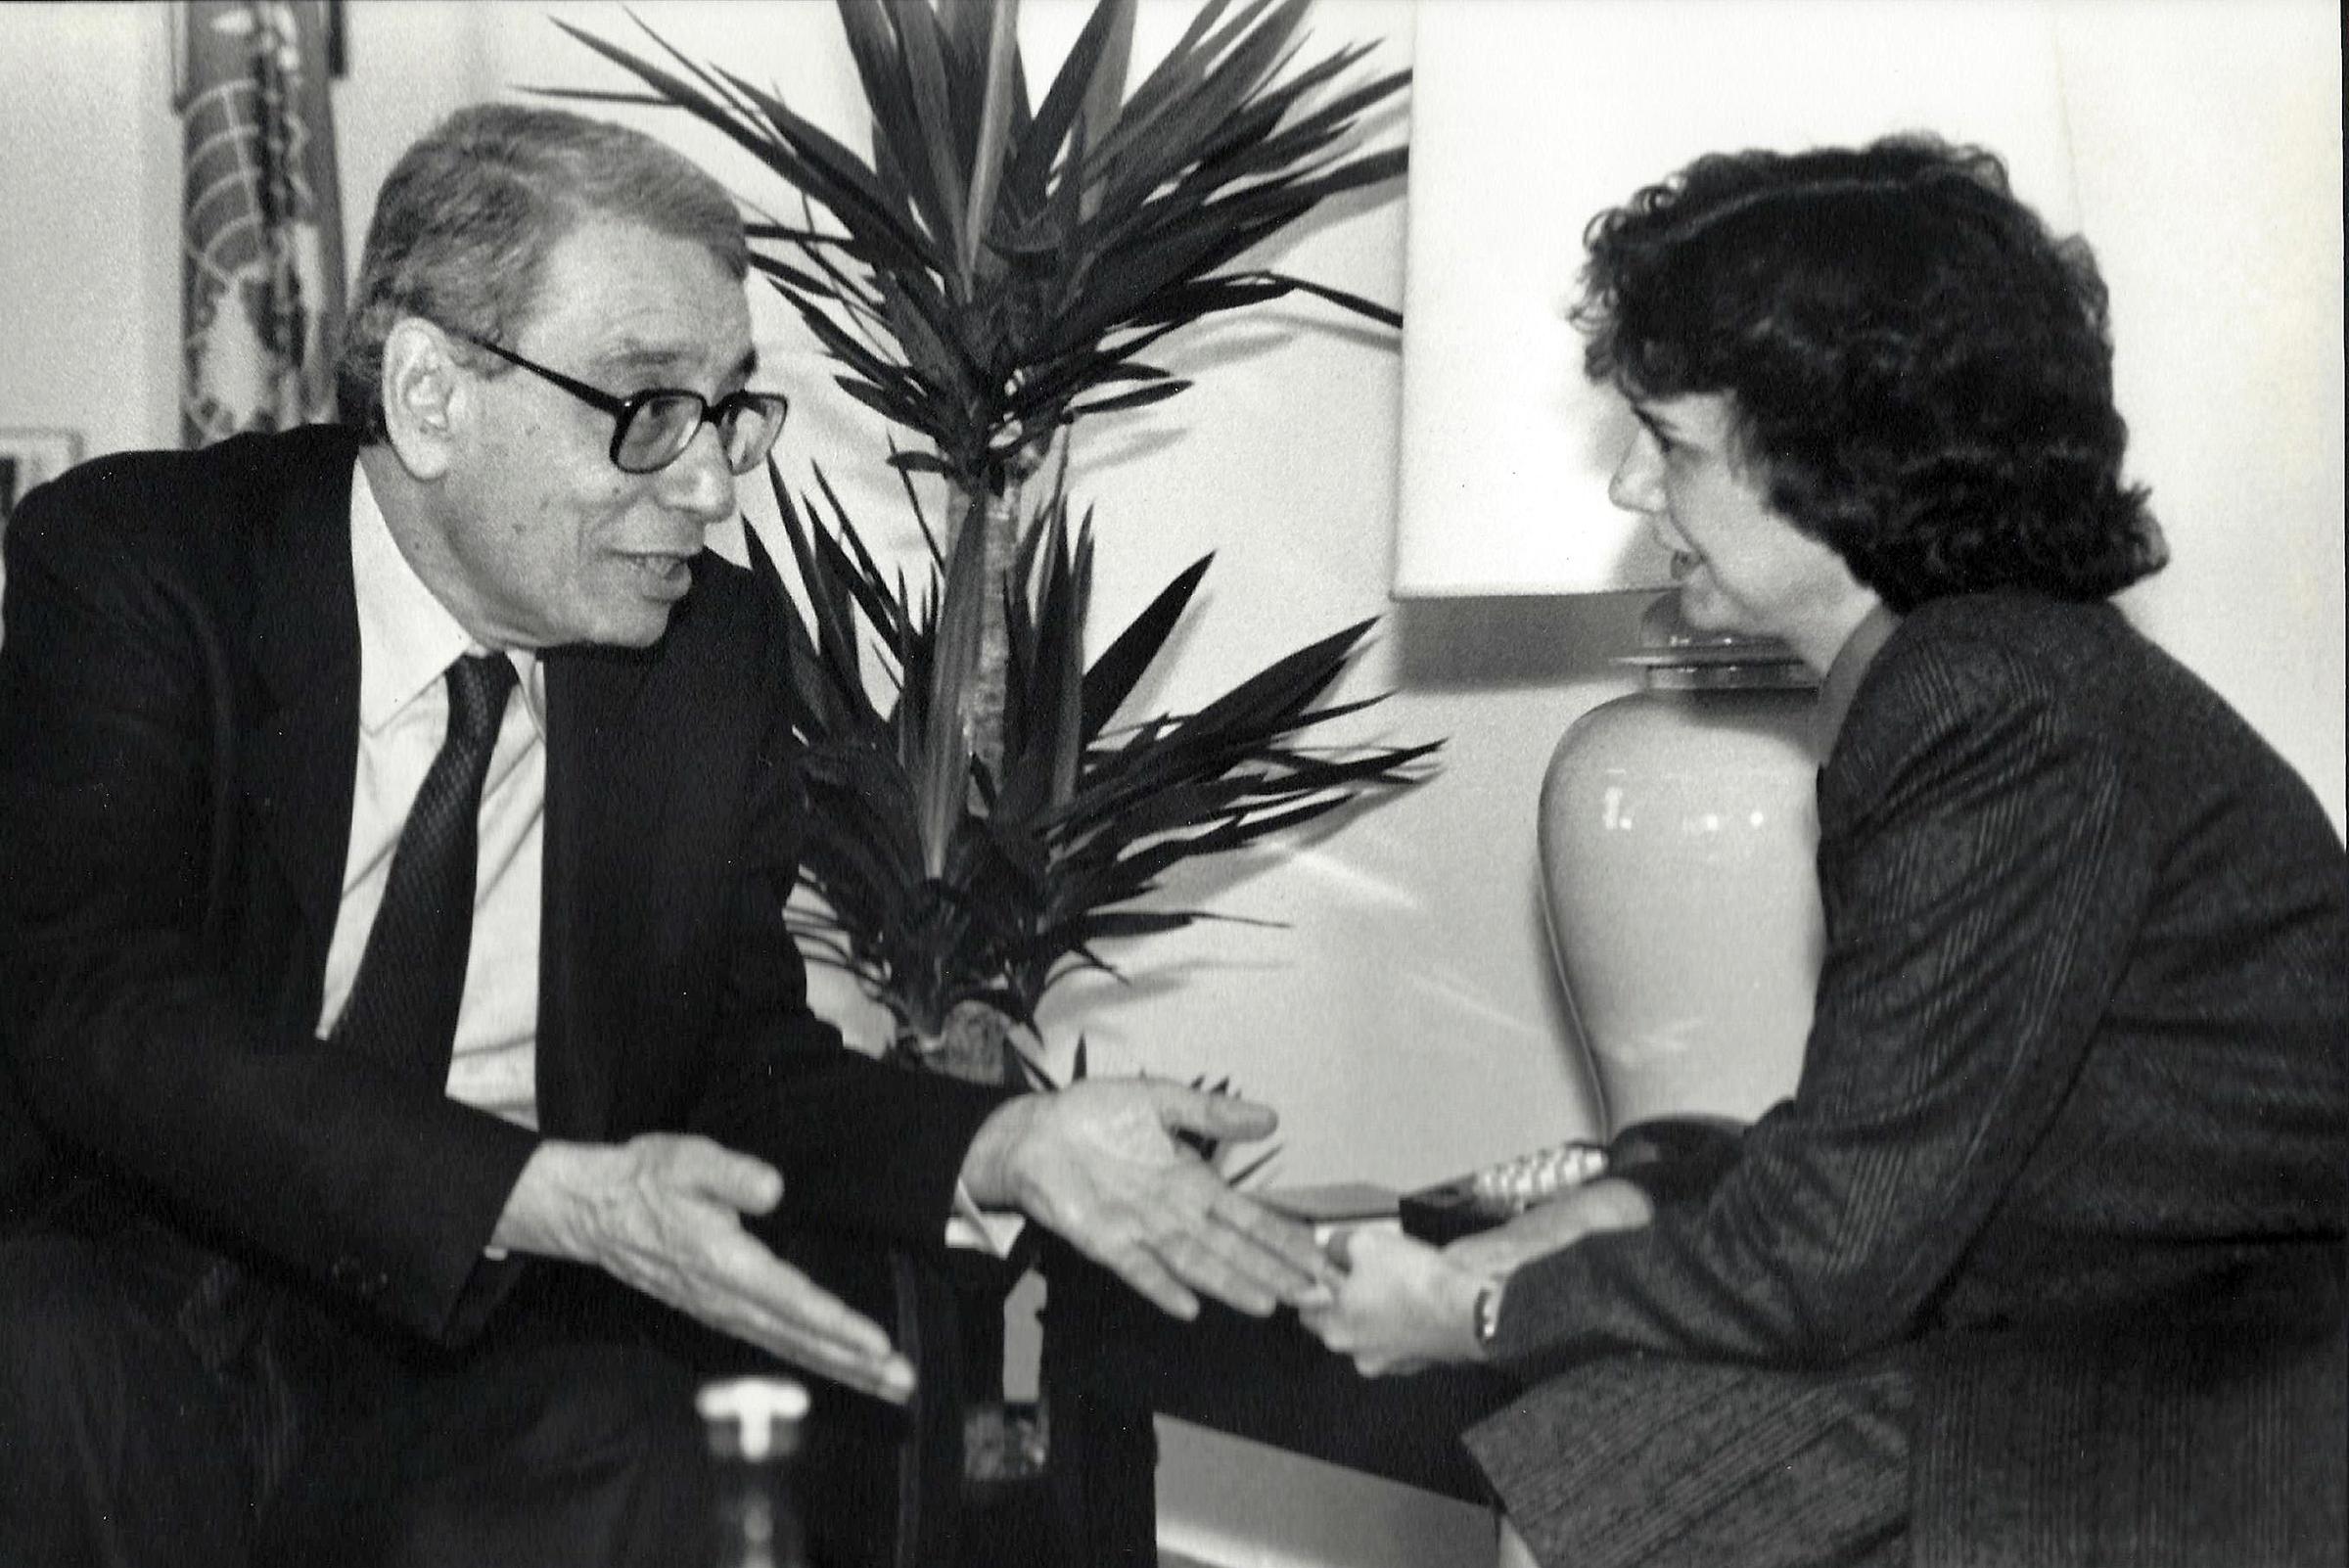 Catheirne Bertini with UN Secretary-General Boutros Boutros-Ghali (1993)